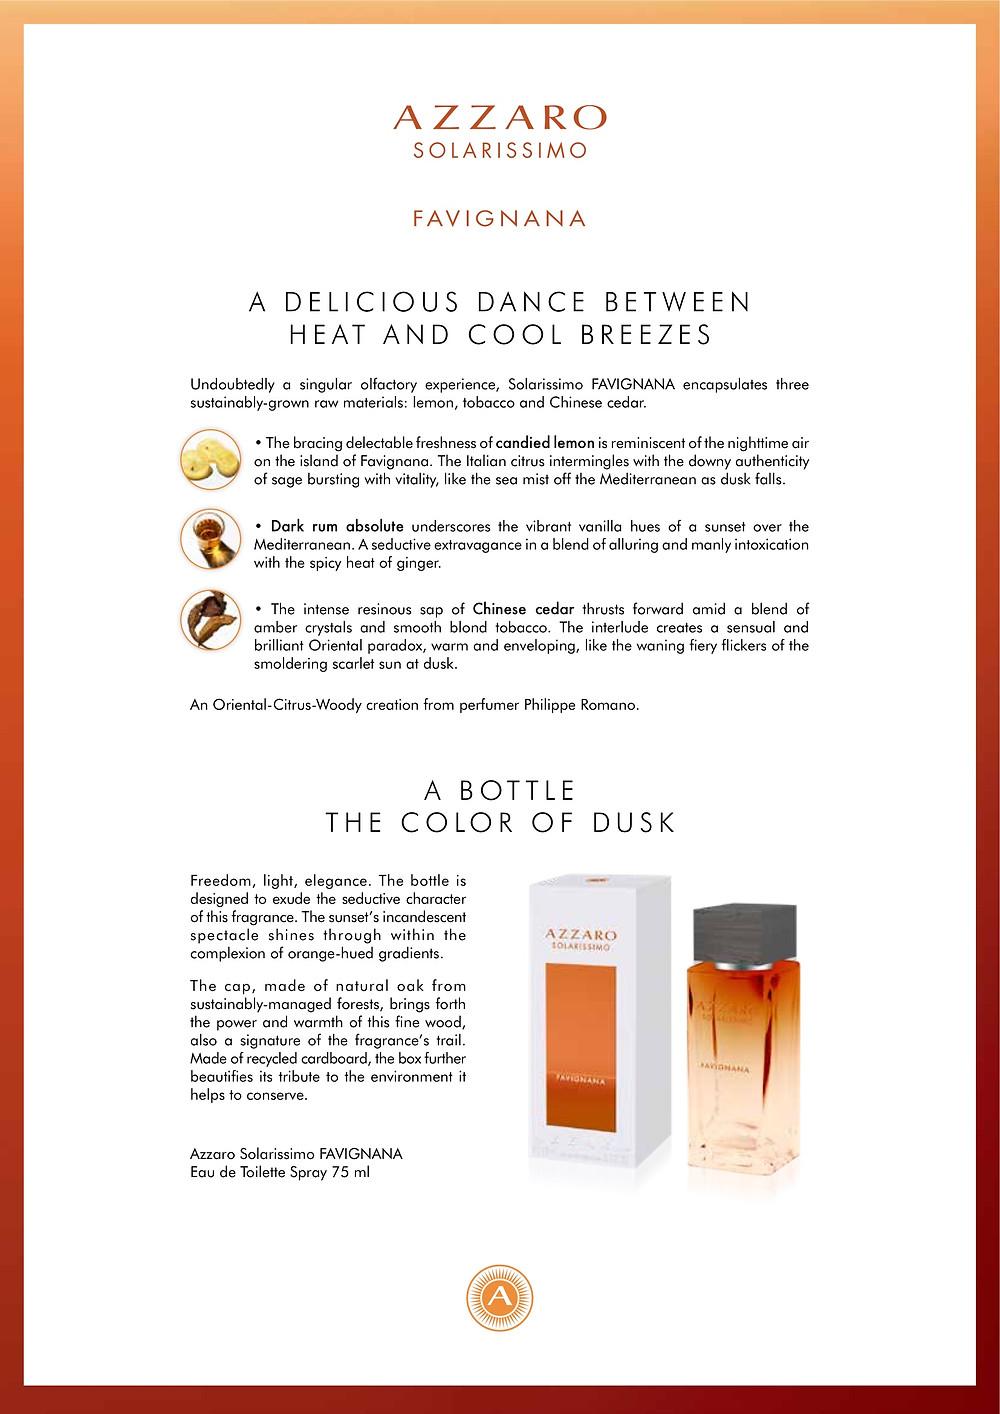 Azzaro Favignanan, A Delicious Dance Between Heat and Cool Breezes | Susan Santora | Copywriter